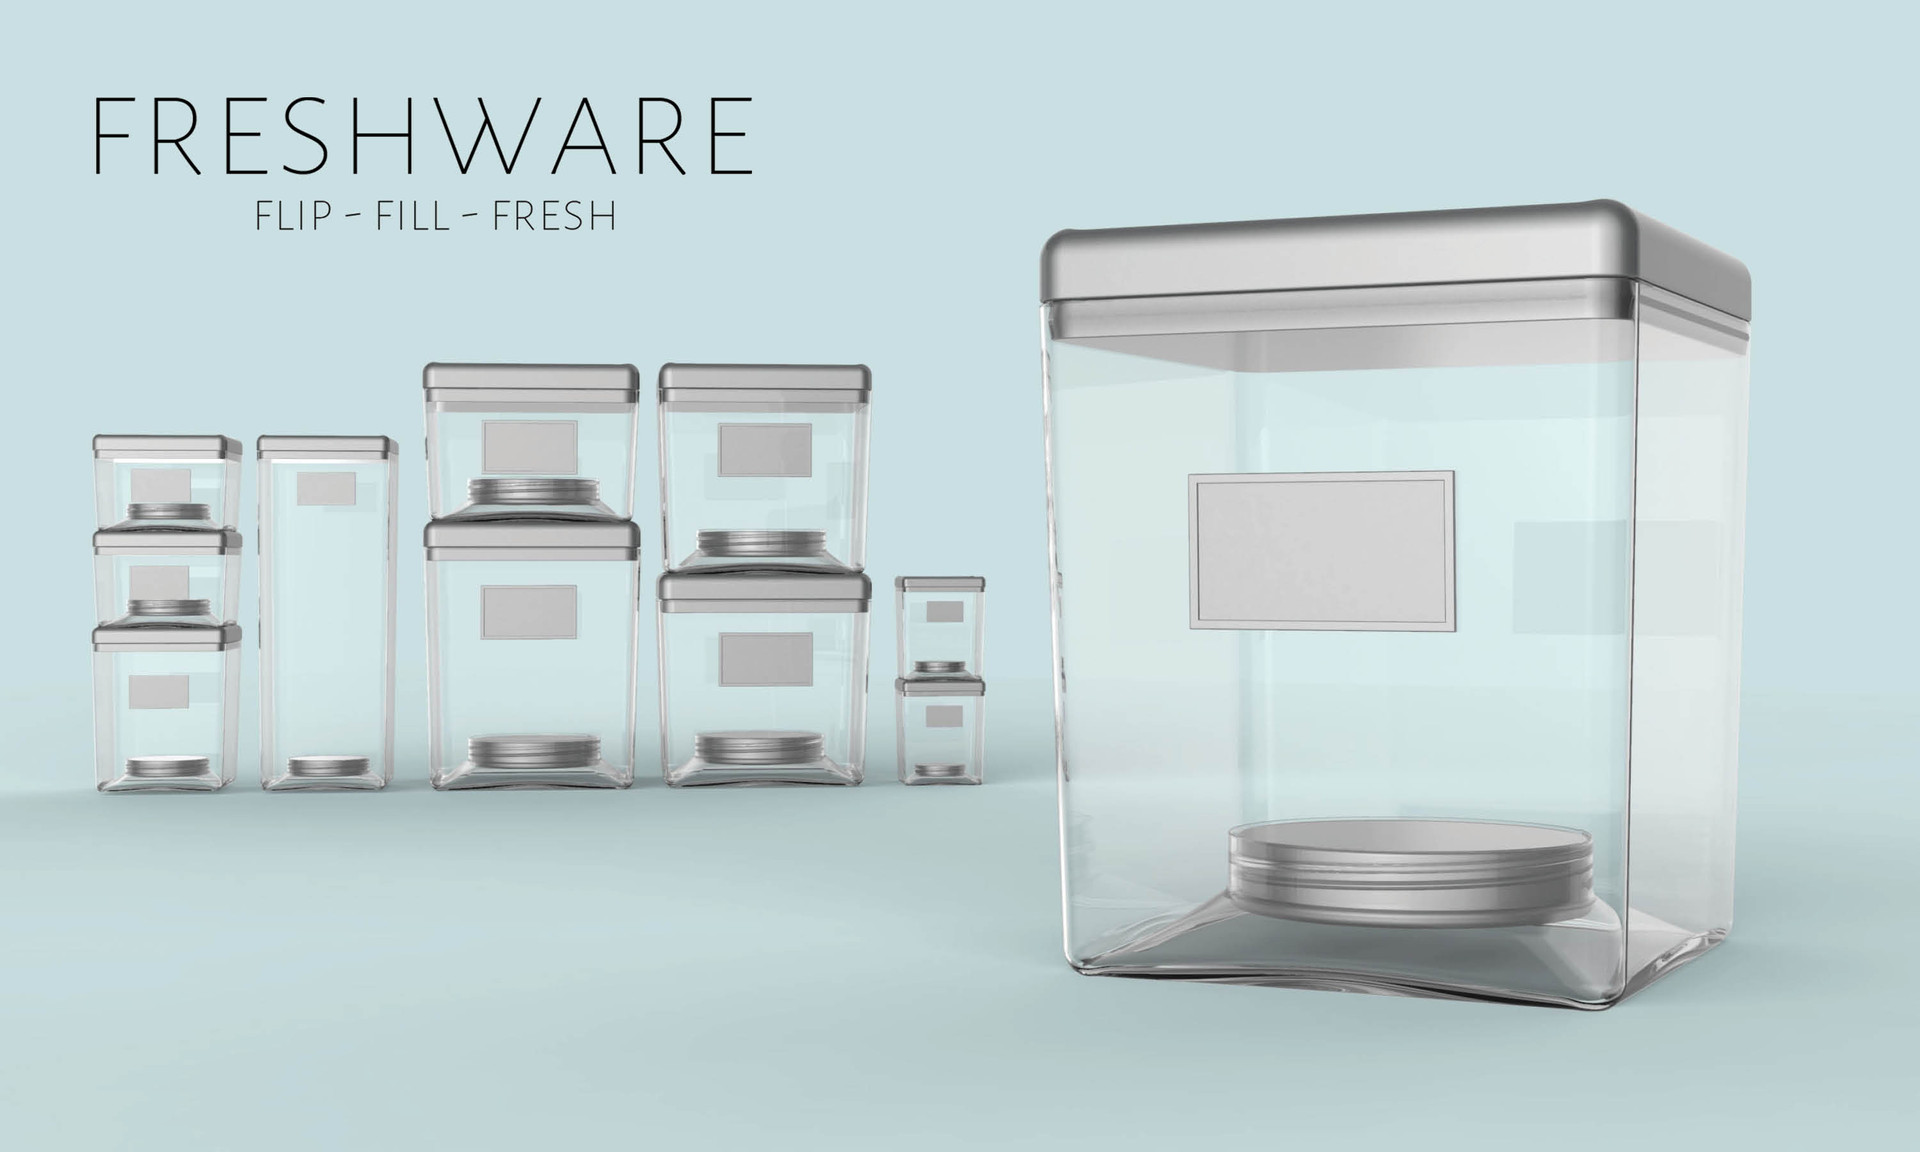 Freshware